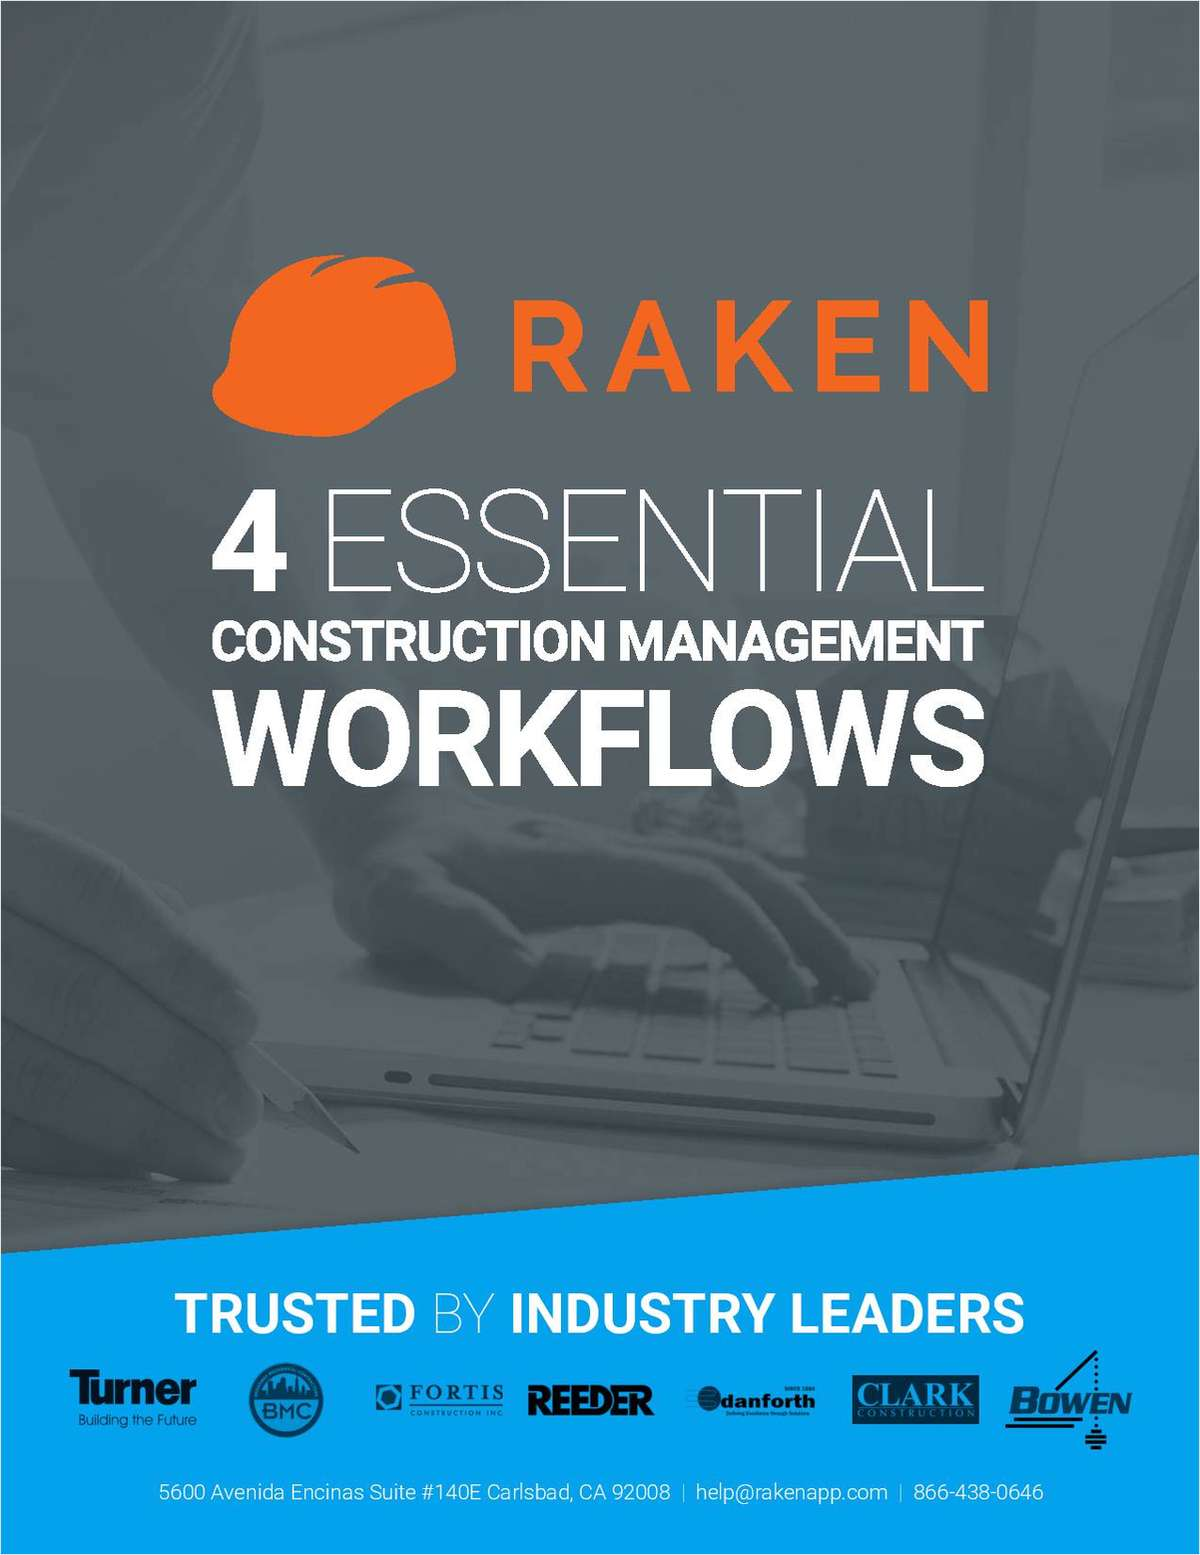 4 Essential Construction Management Workflows